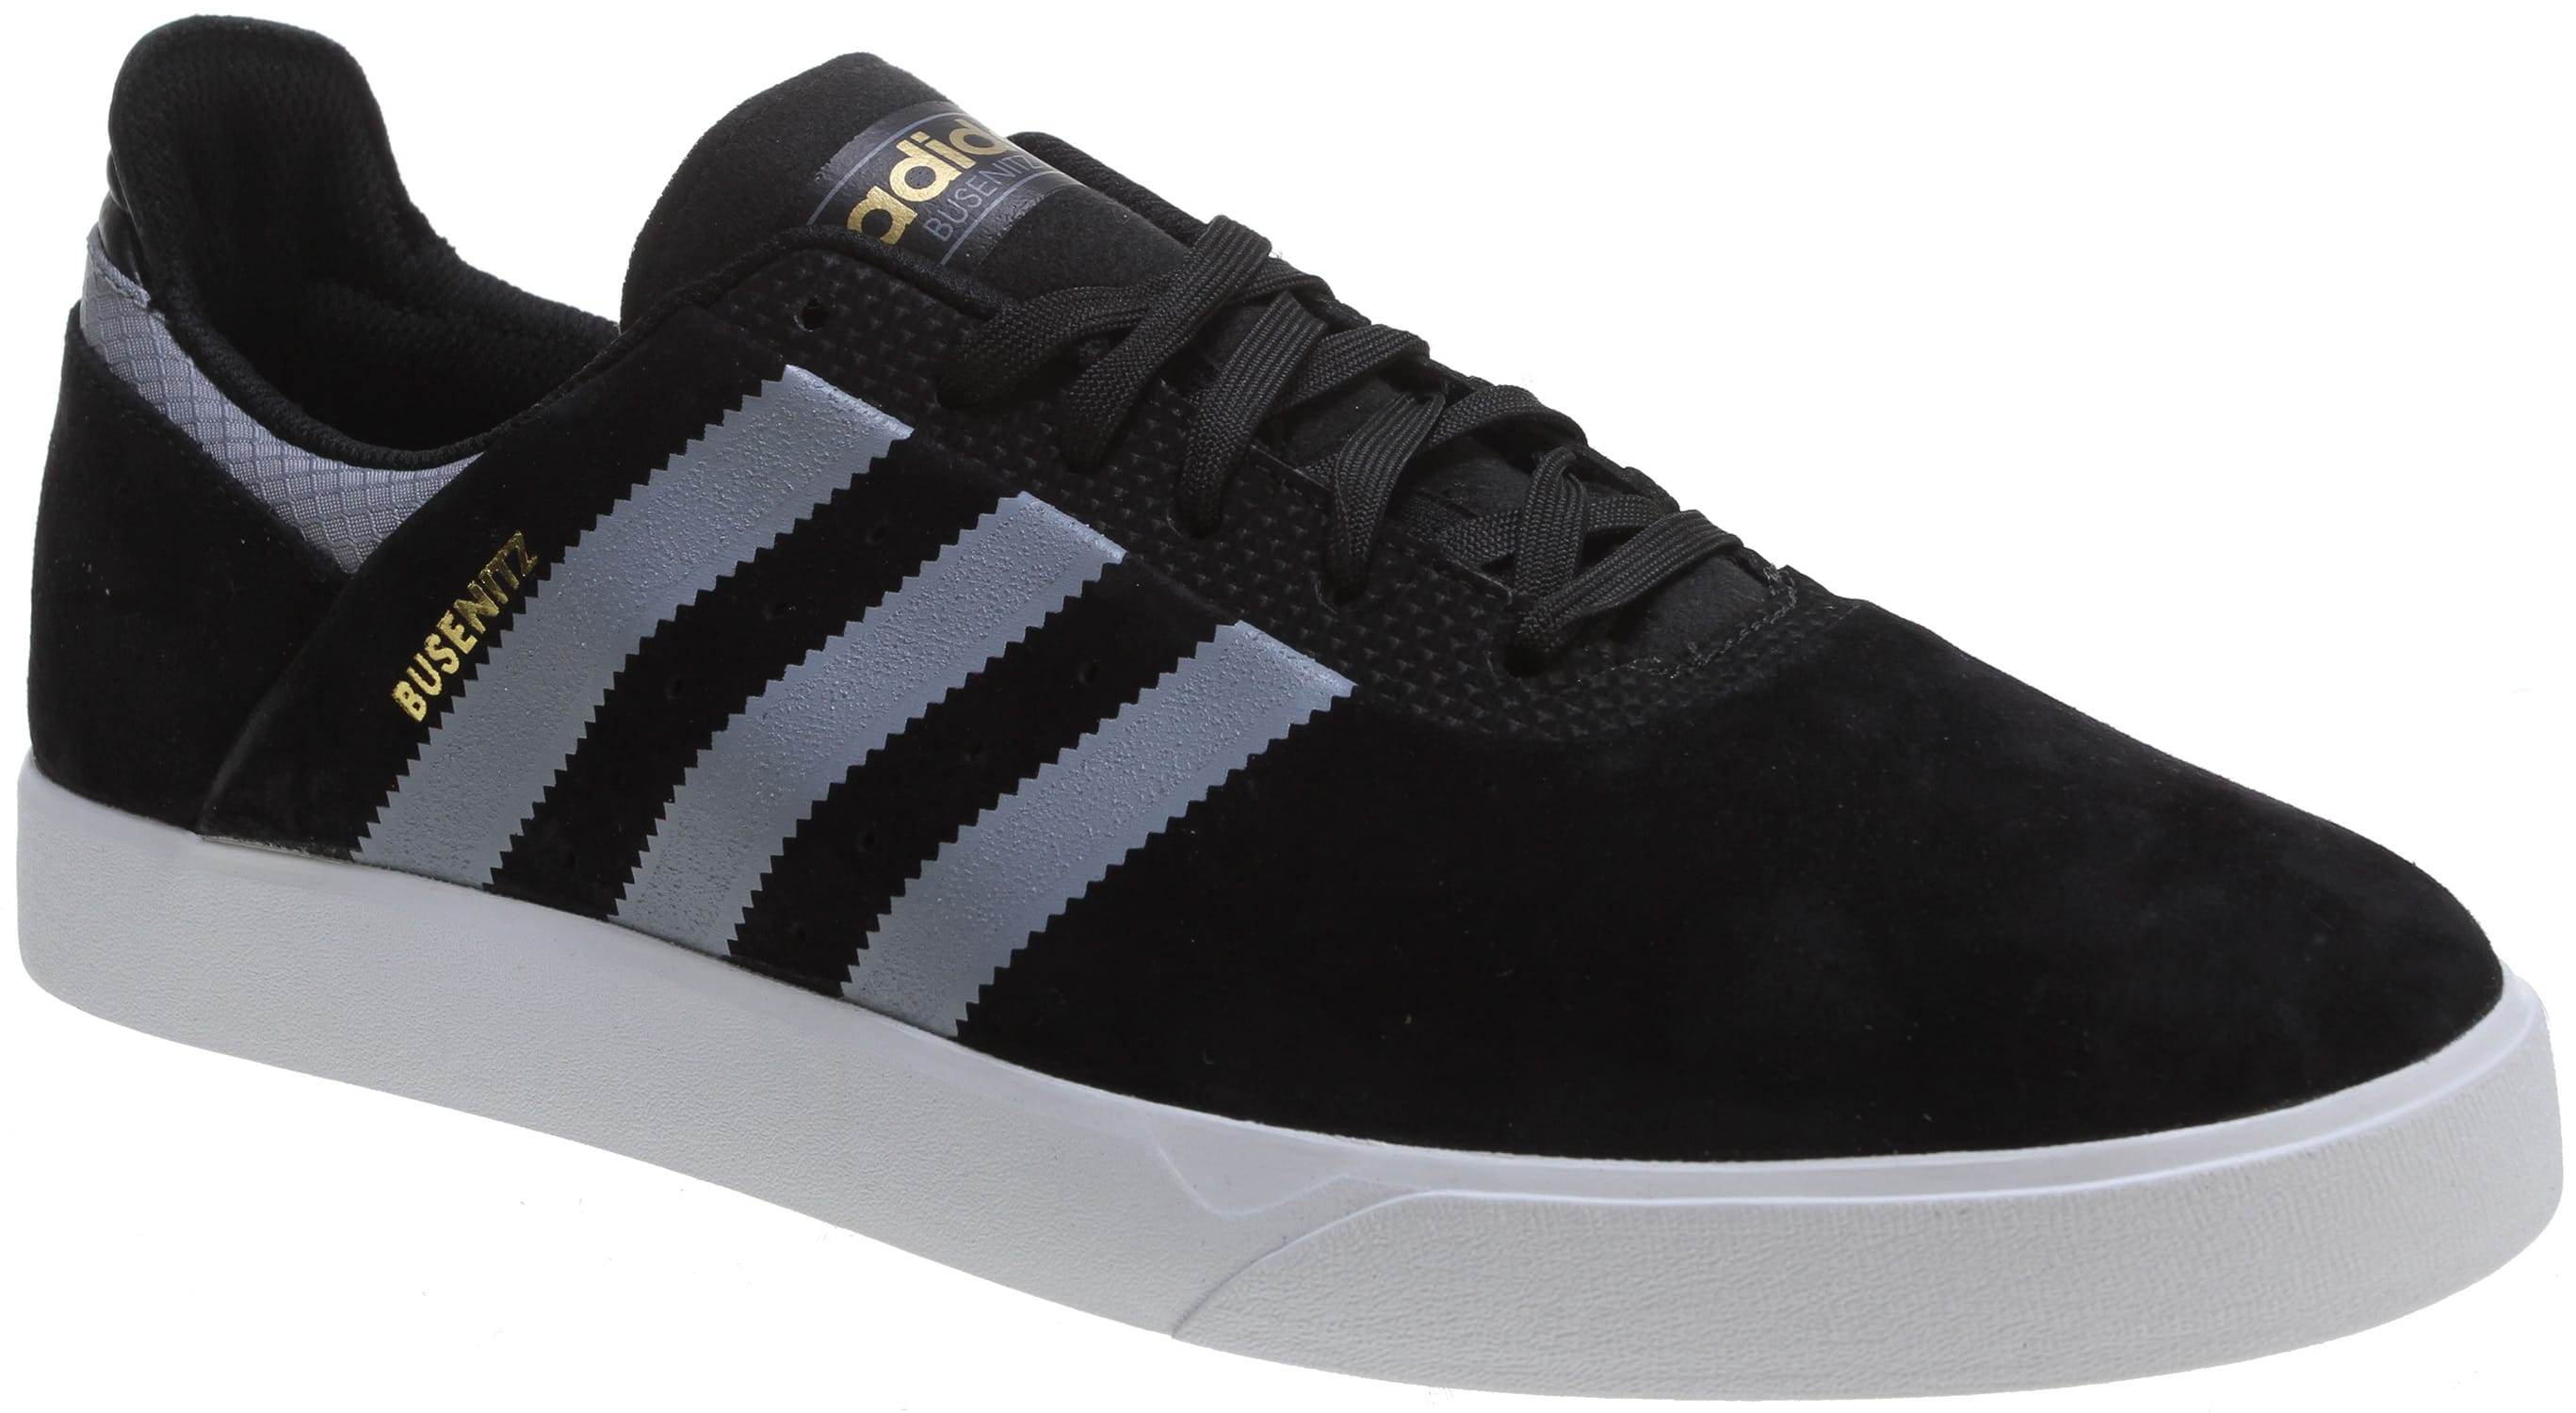 02a45a1e162a Adidas Busenitz Adv Skate Shoes - thumbnail 2